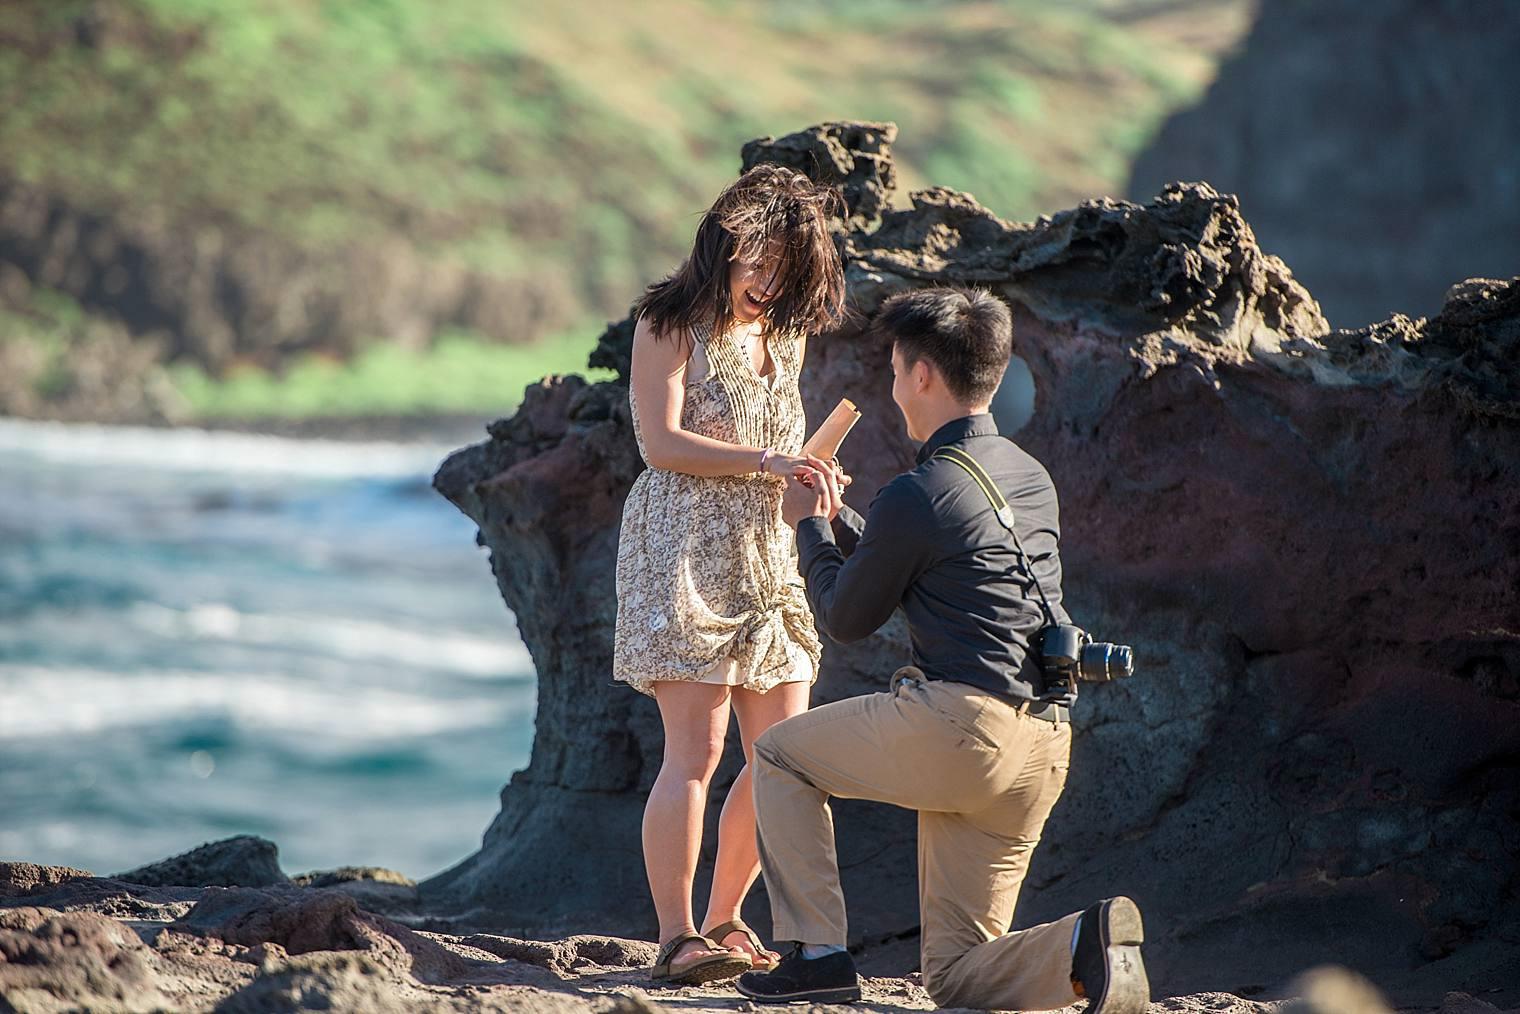 Surprise heart rock proposal in maui, hawaii